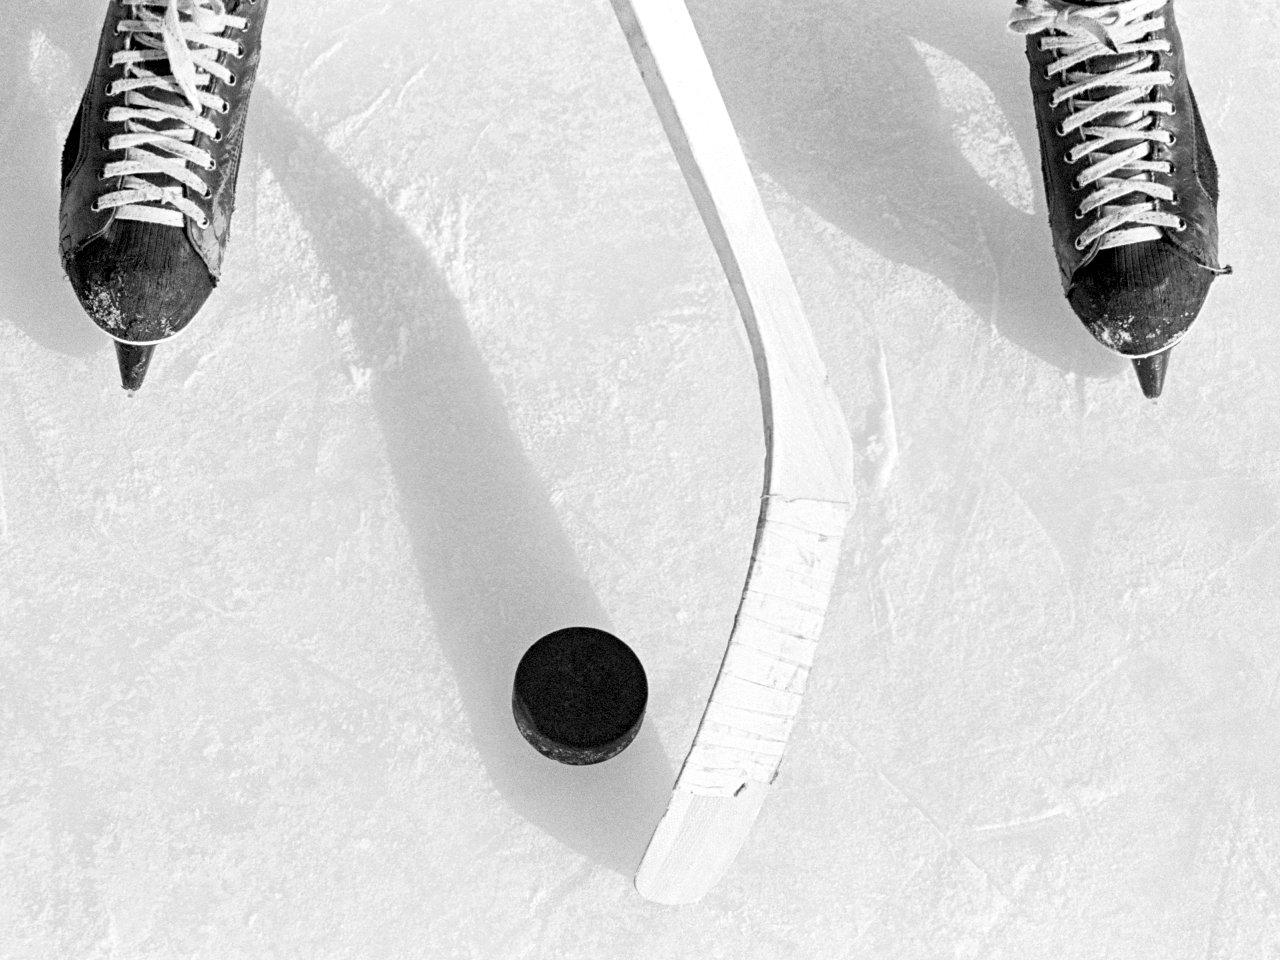 Ice Hockey Wallpaper 19681 1280960 px fond ecran 1280x960